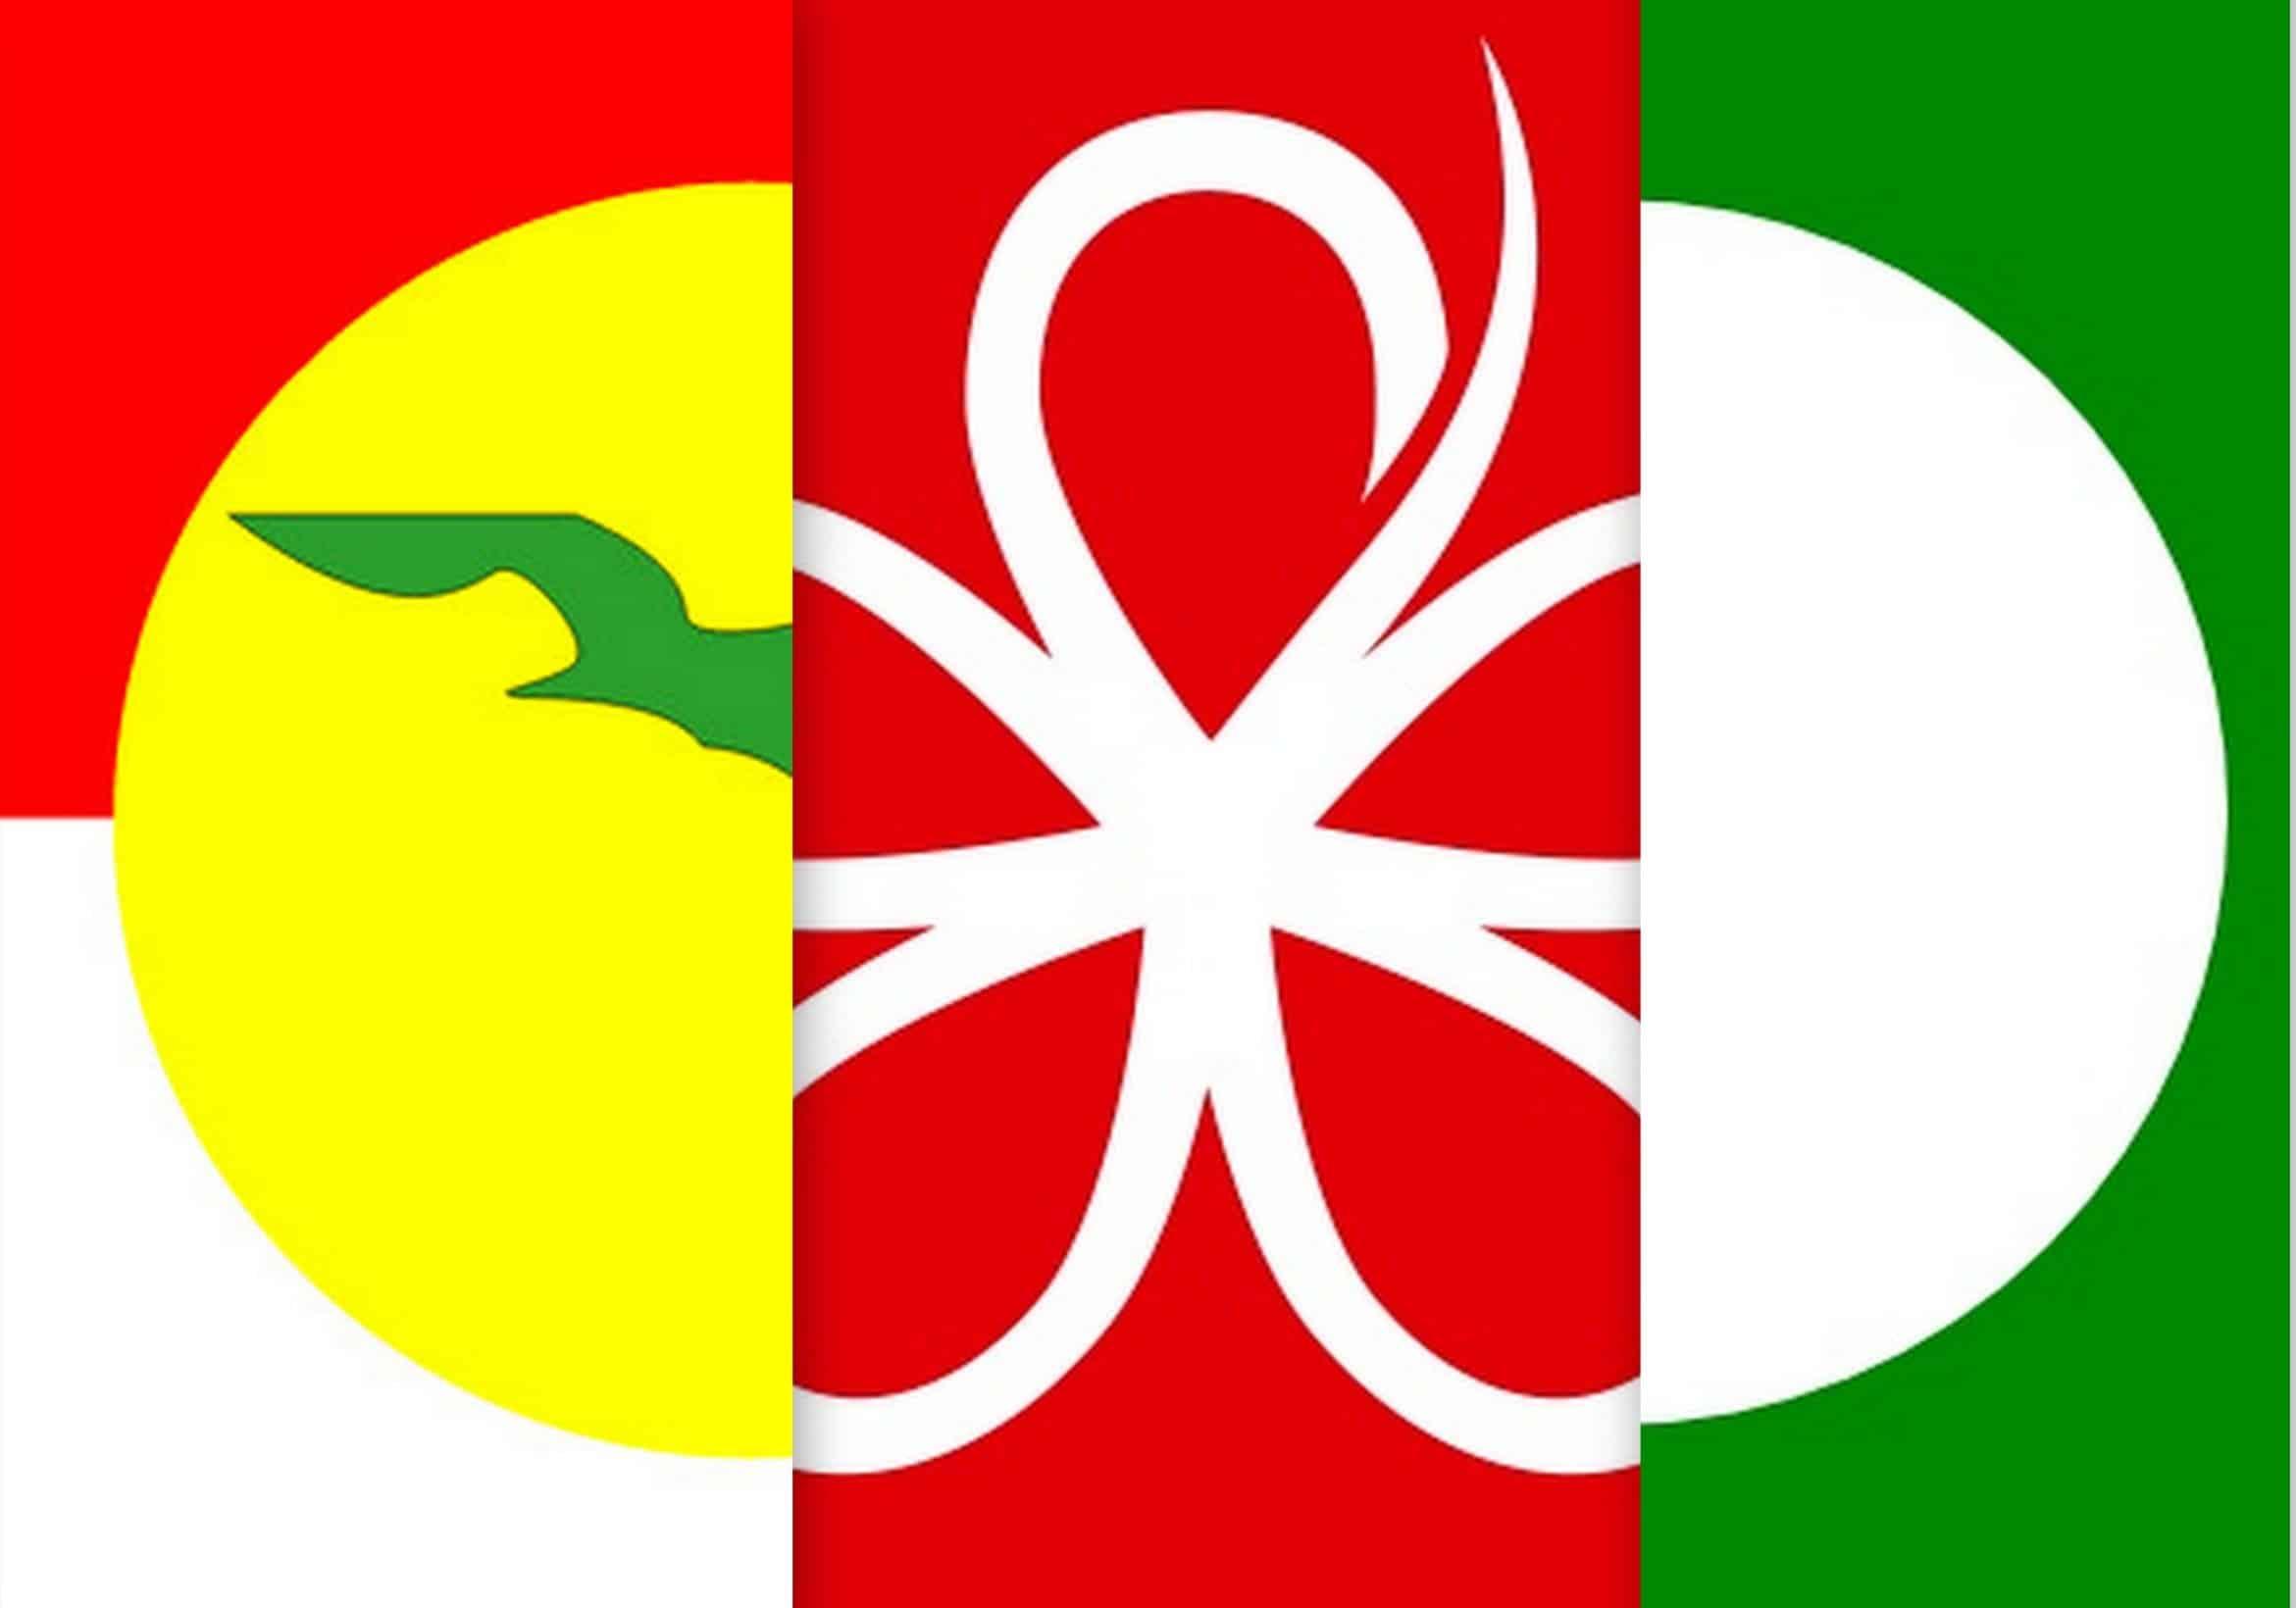 Pas yakin kerjasama politik dengan BN, Bersatu sedia hadapi PRU-15